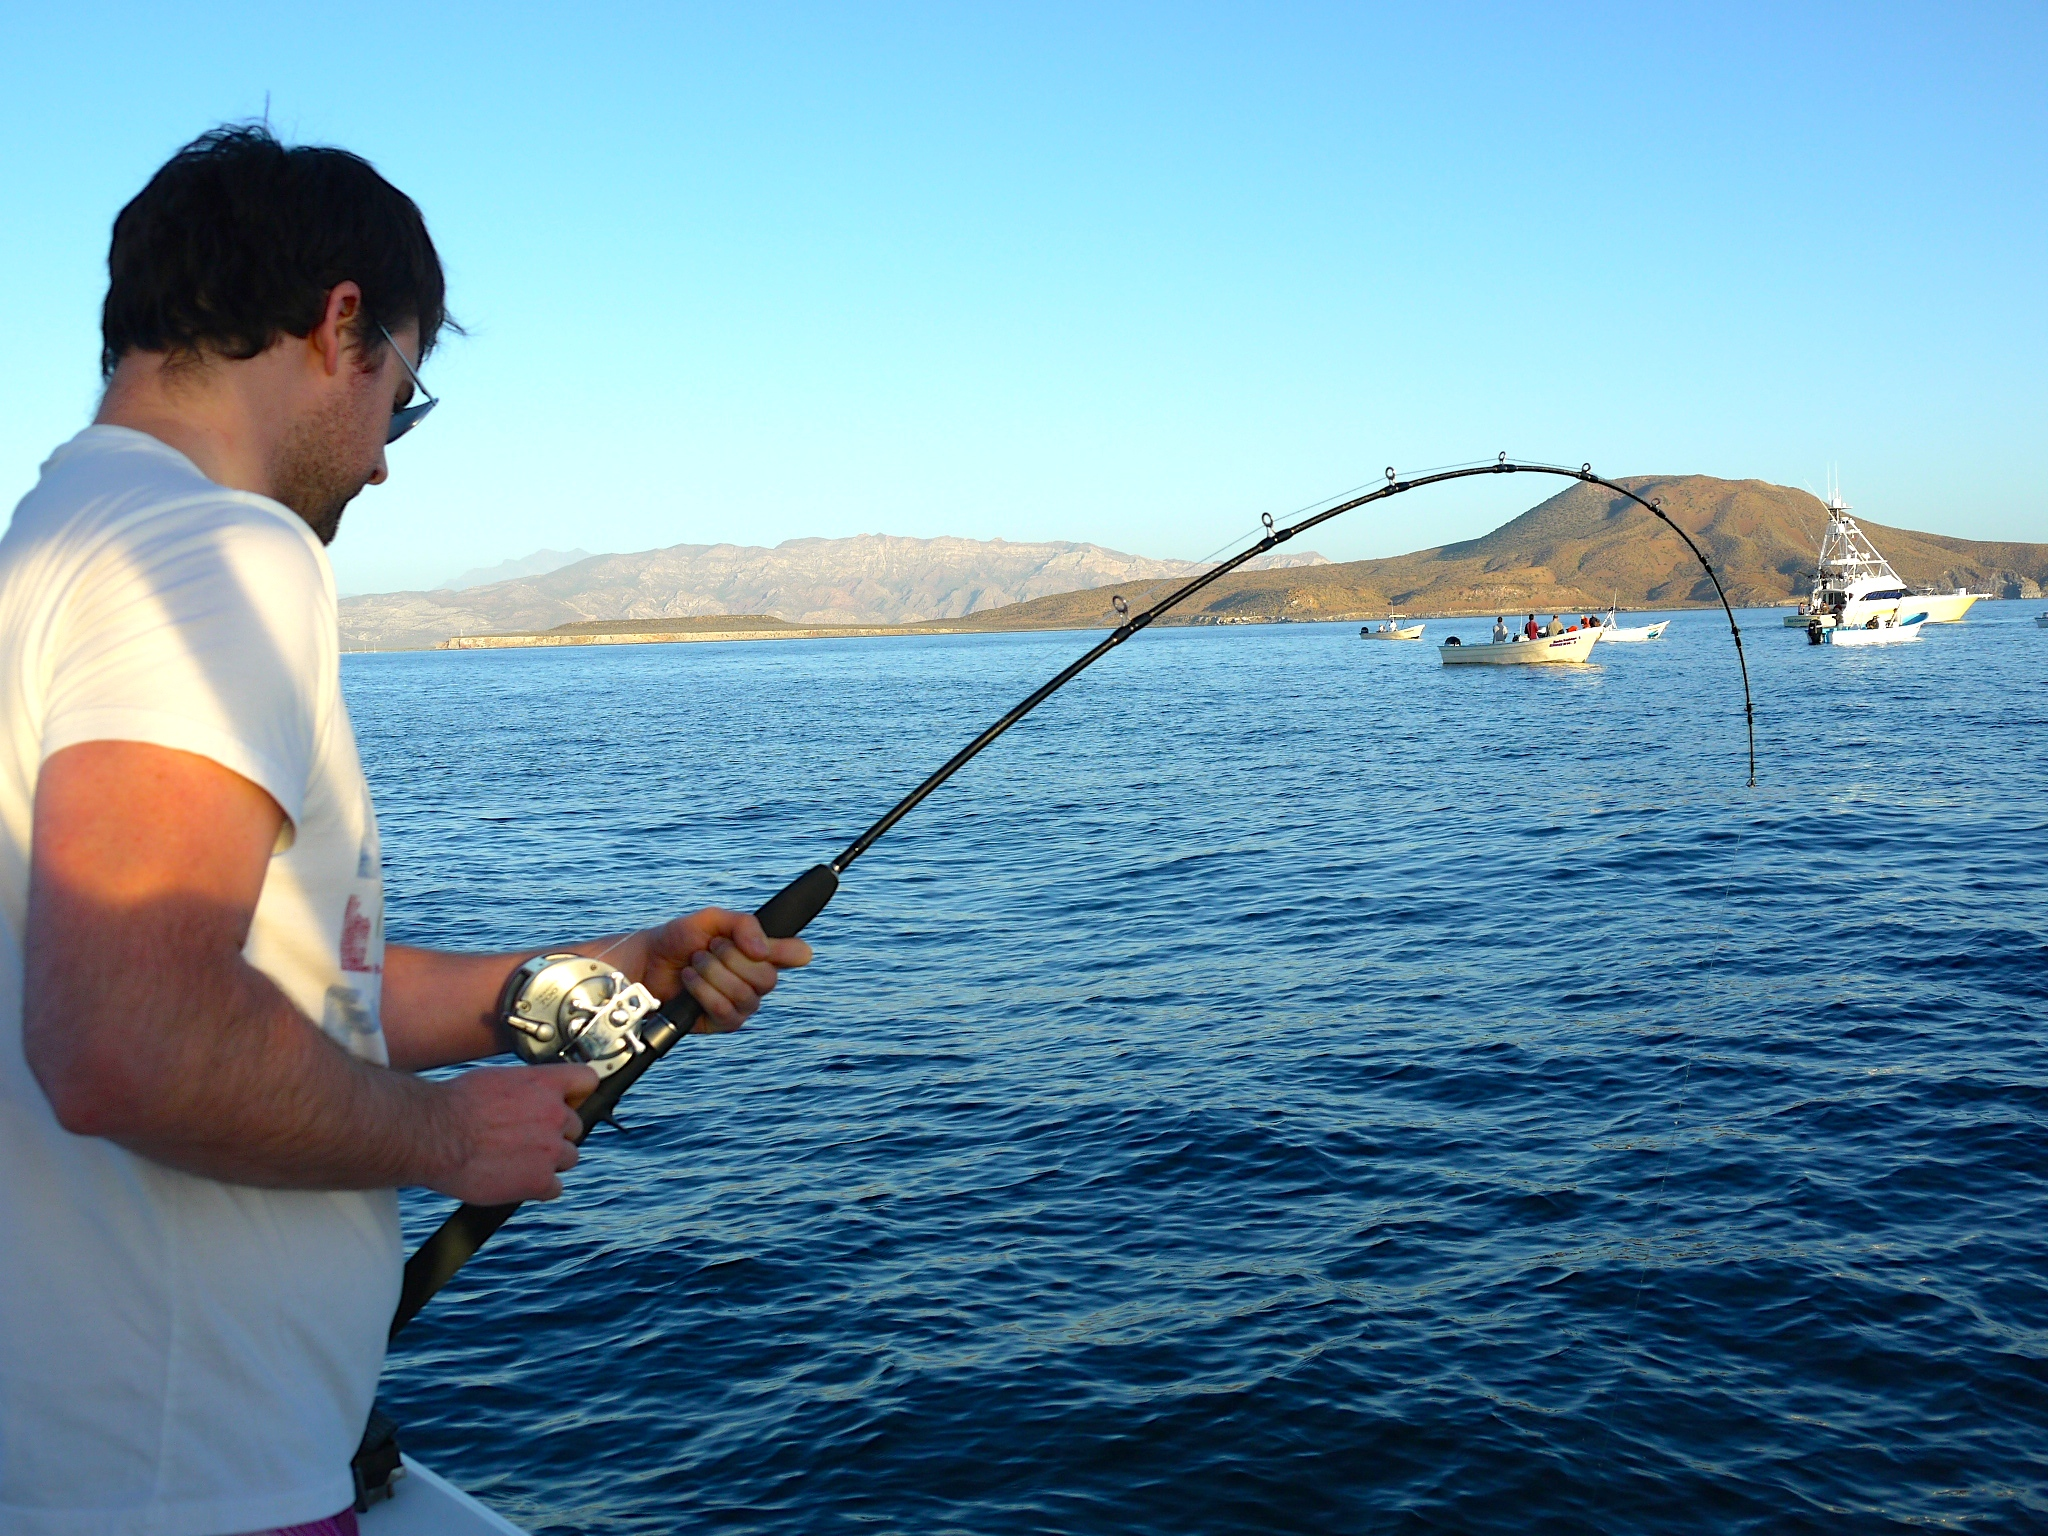 Ryan's big fish broke the line